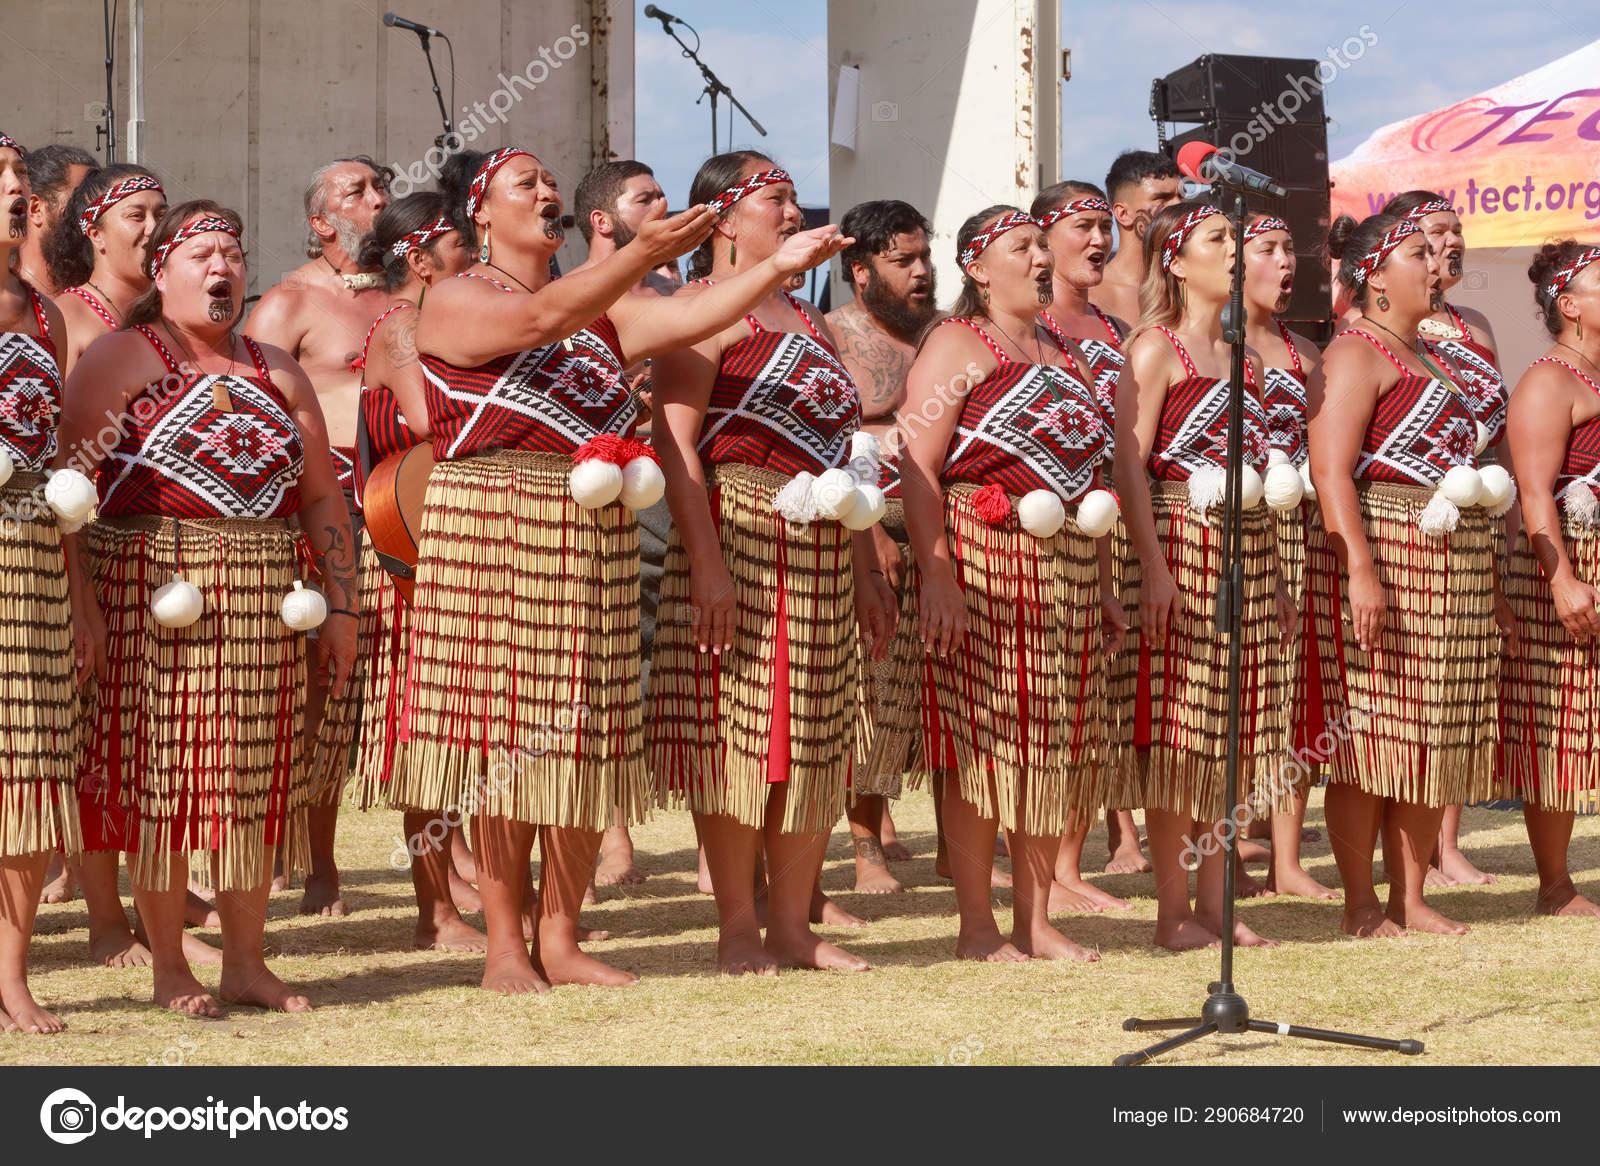 Maori Dance: New Zealand Maori Women Kapa Haka Dance Group Performing